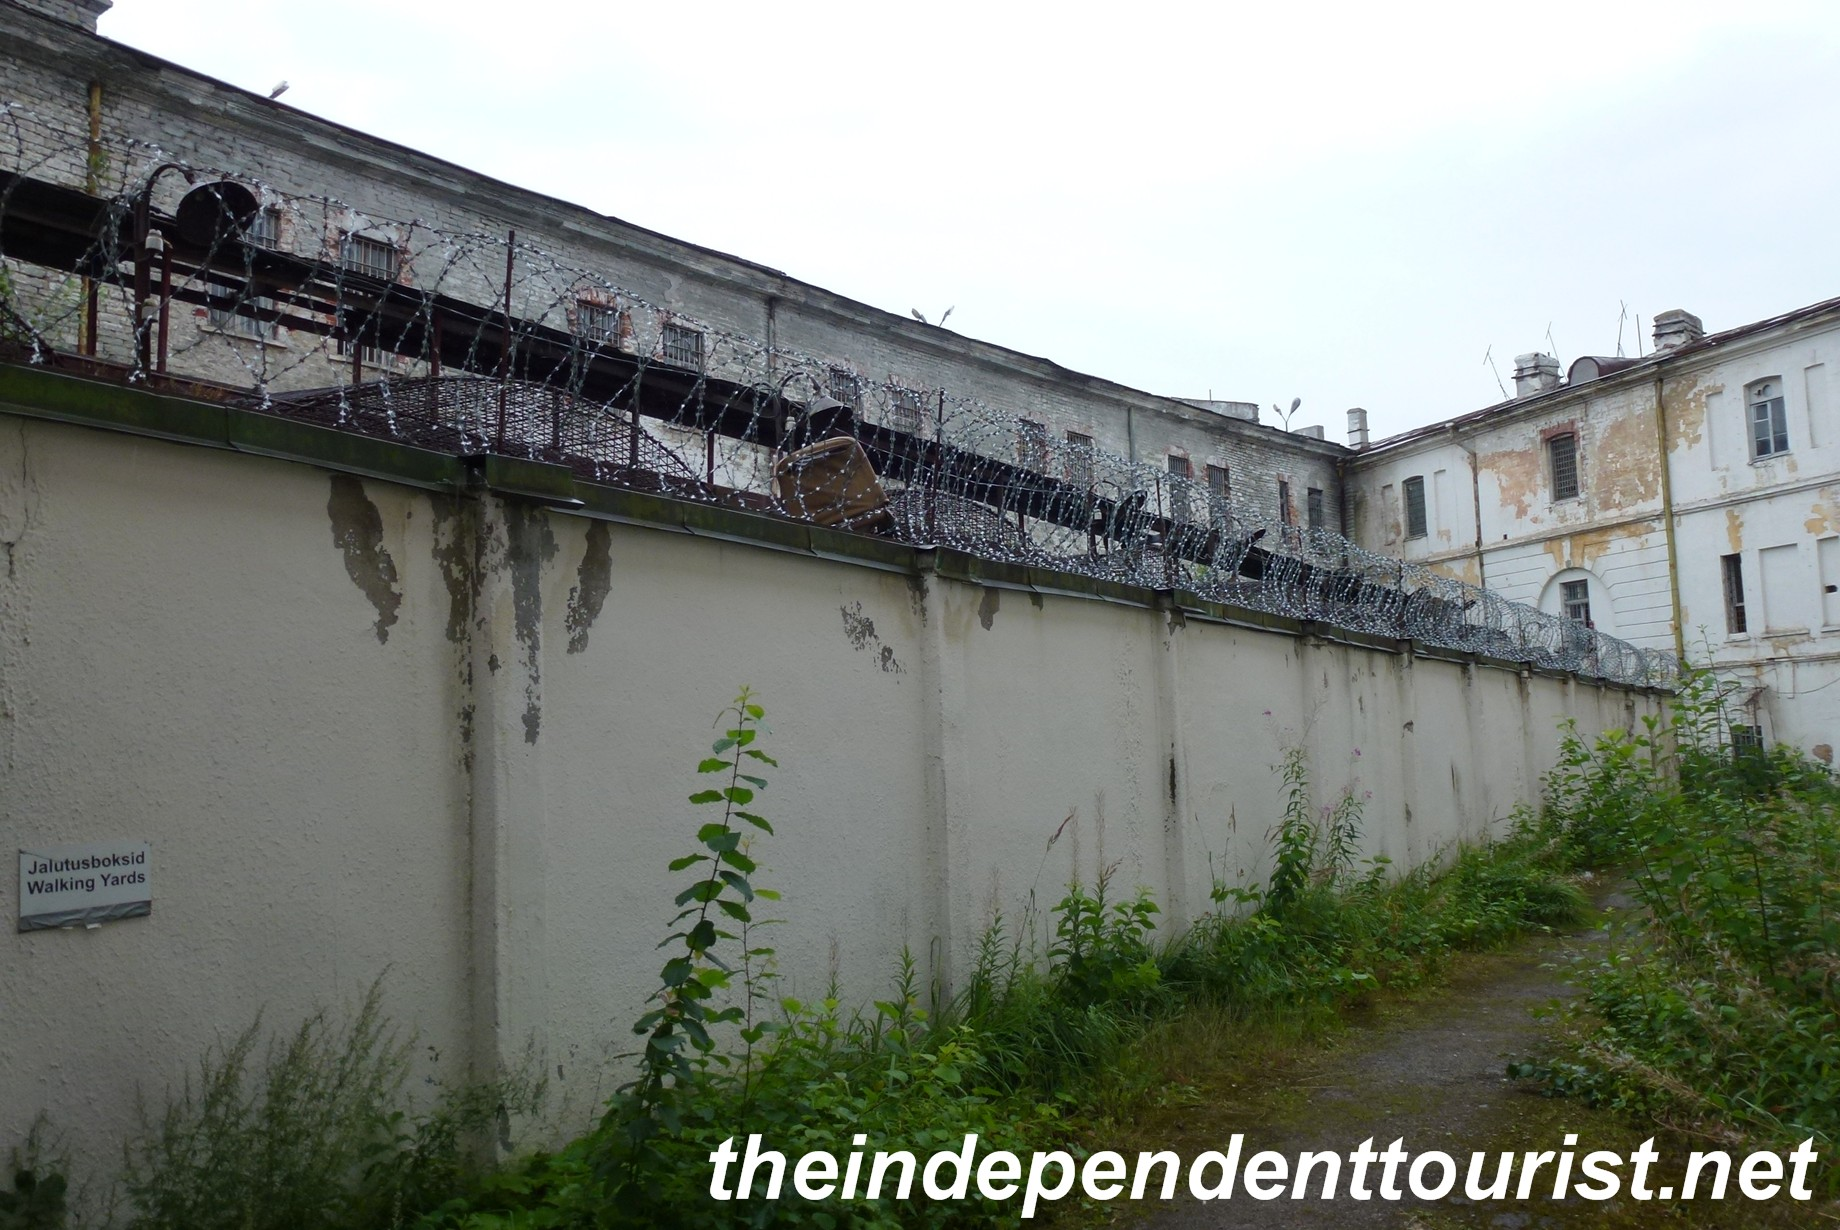 Patarei Prison   The Independent Tourist